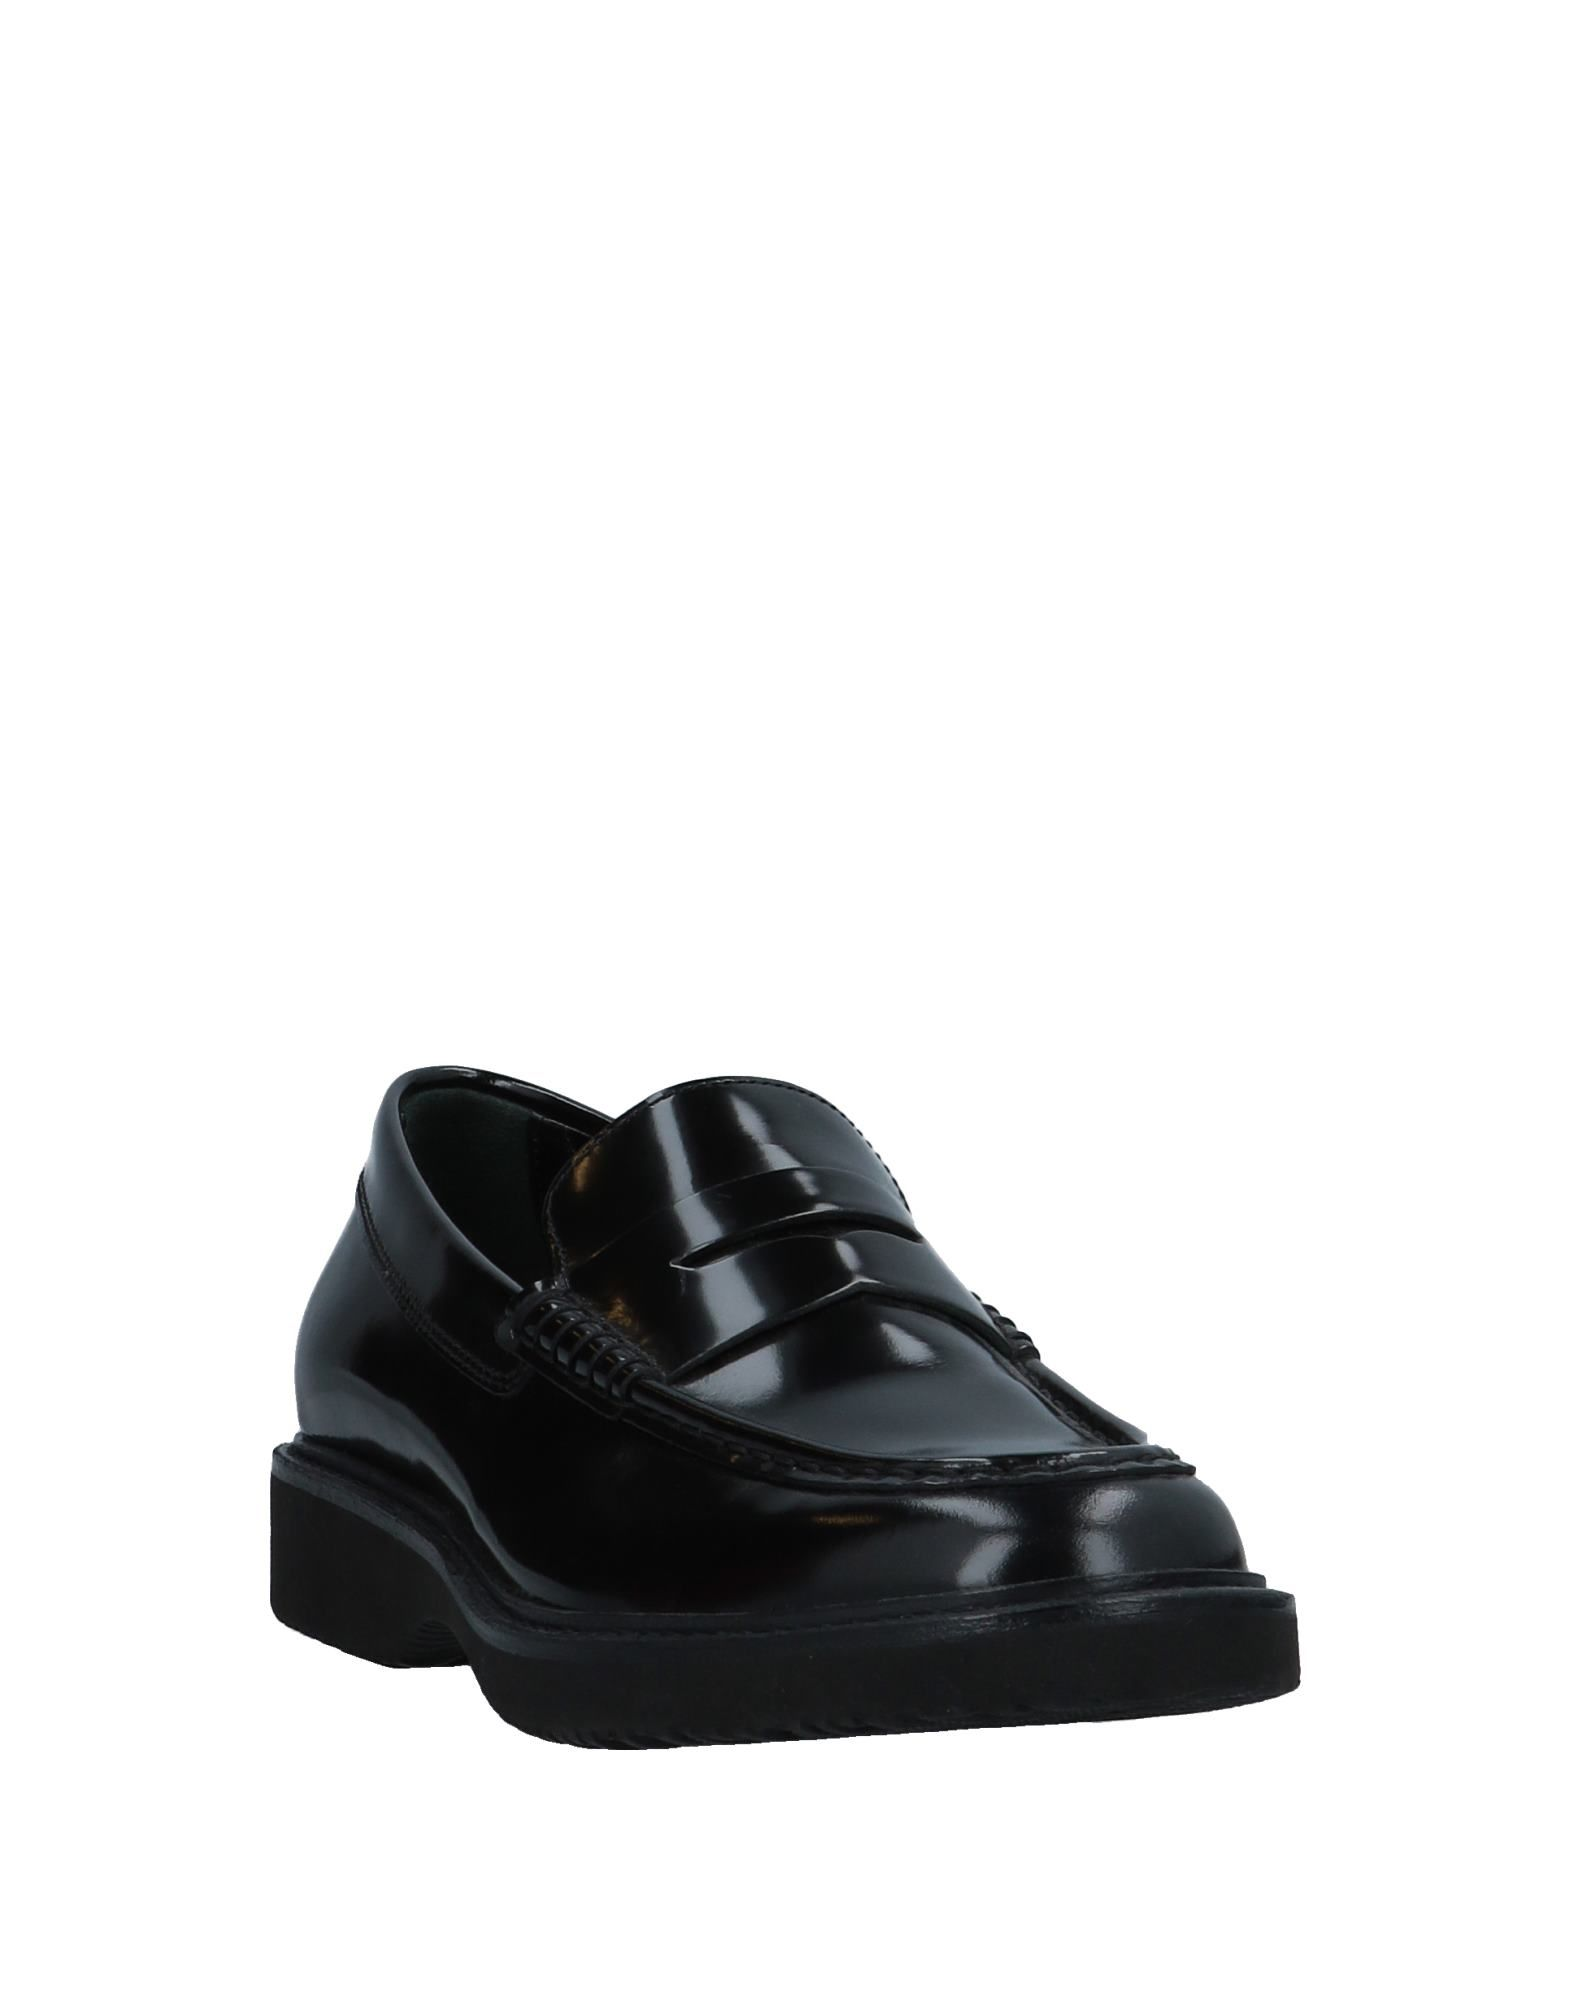 Hogan Loafers Loafers Loafers - Men Hogan Loafers online on  Australia - 11509310WS 6910d6